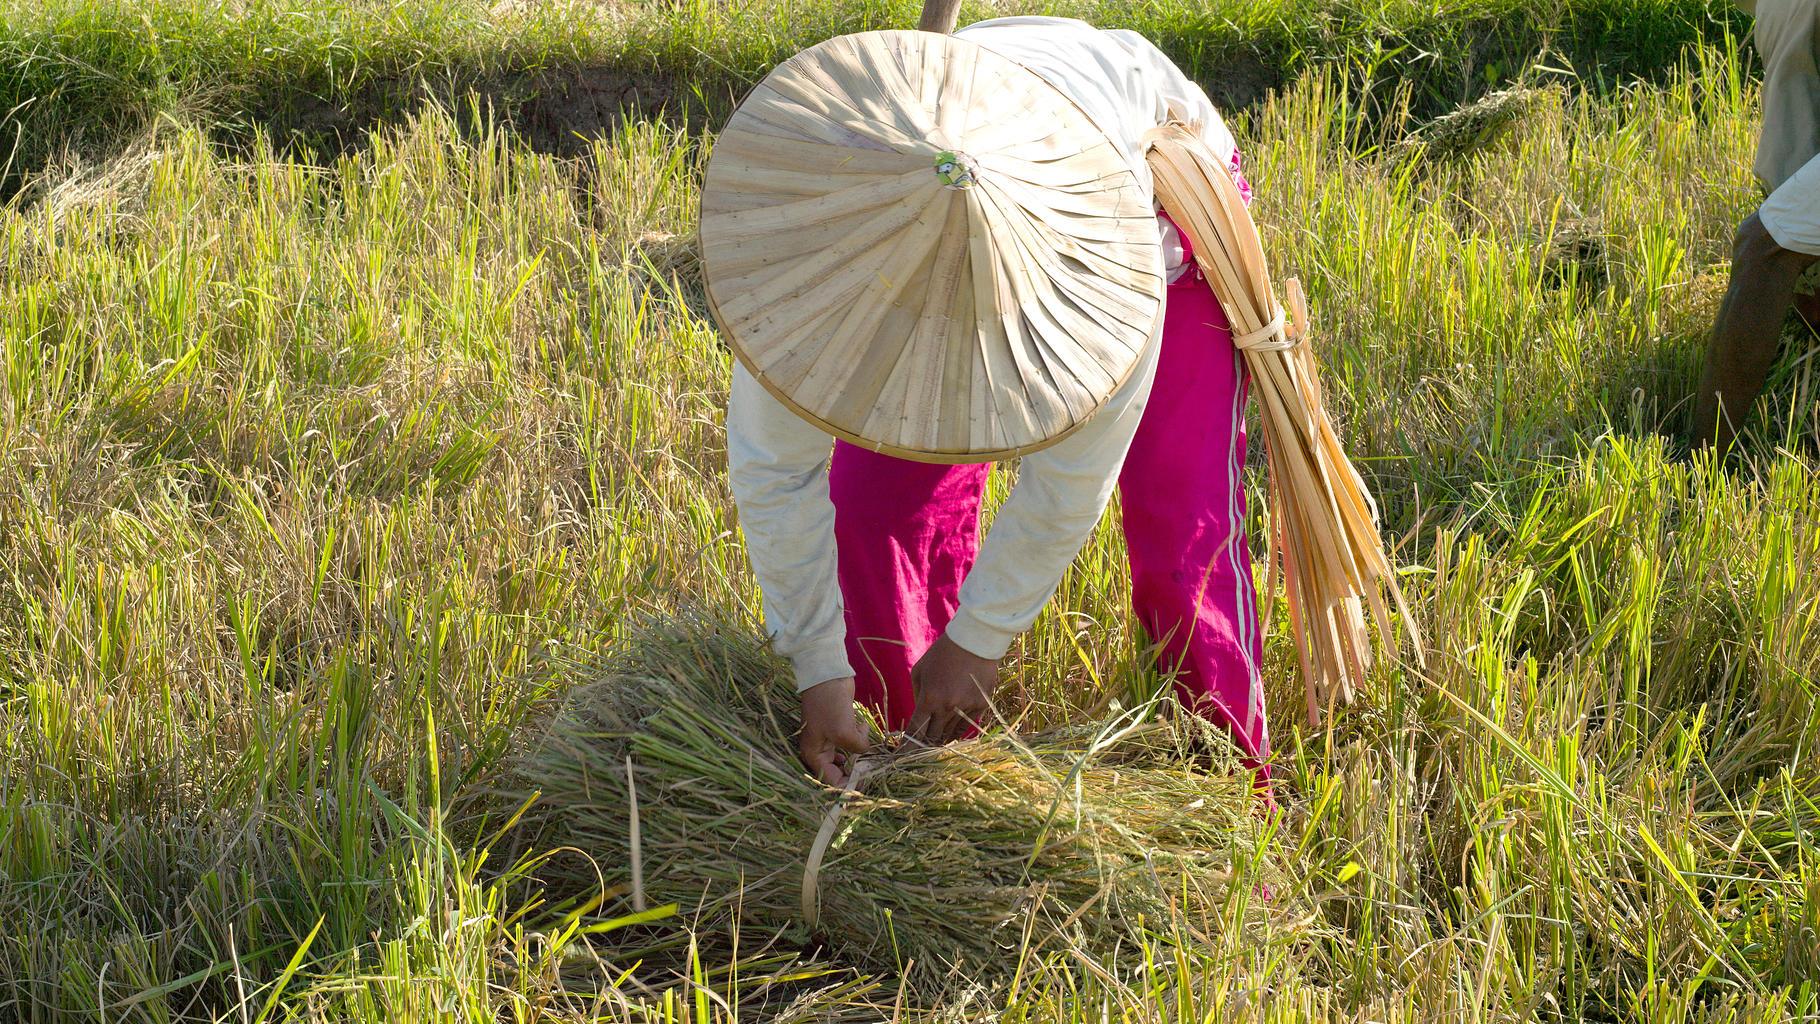 Jilena Pineda lernte im Oxfam Workshop das System of Rice Intensification kennen